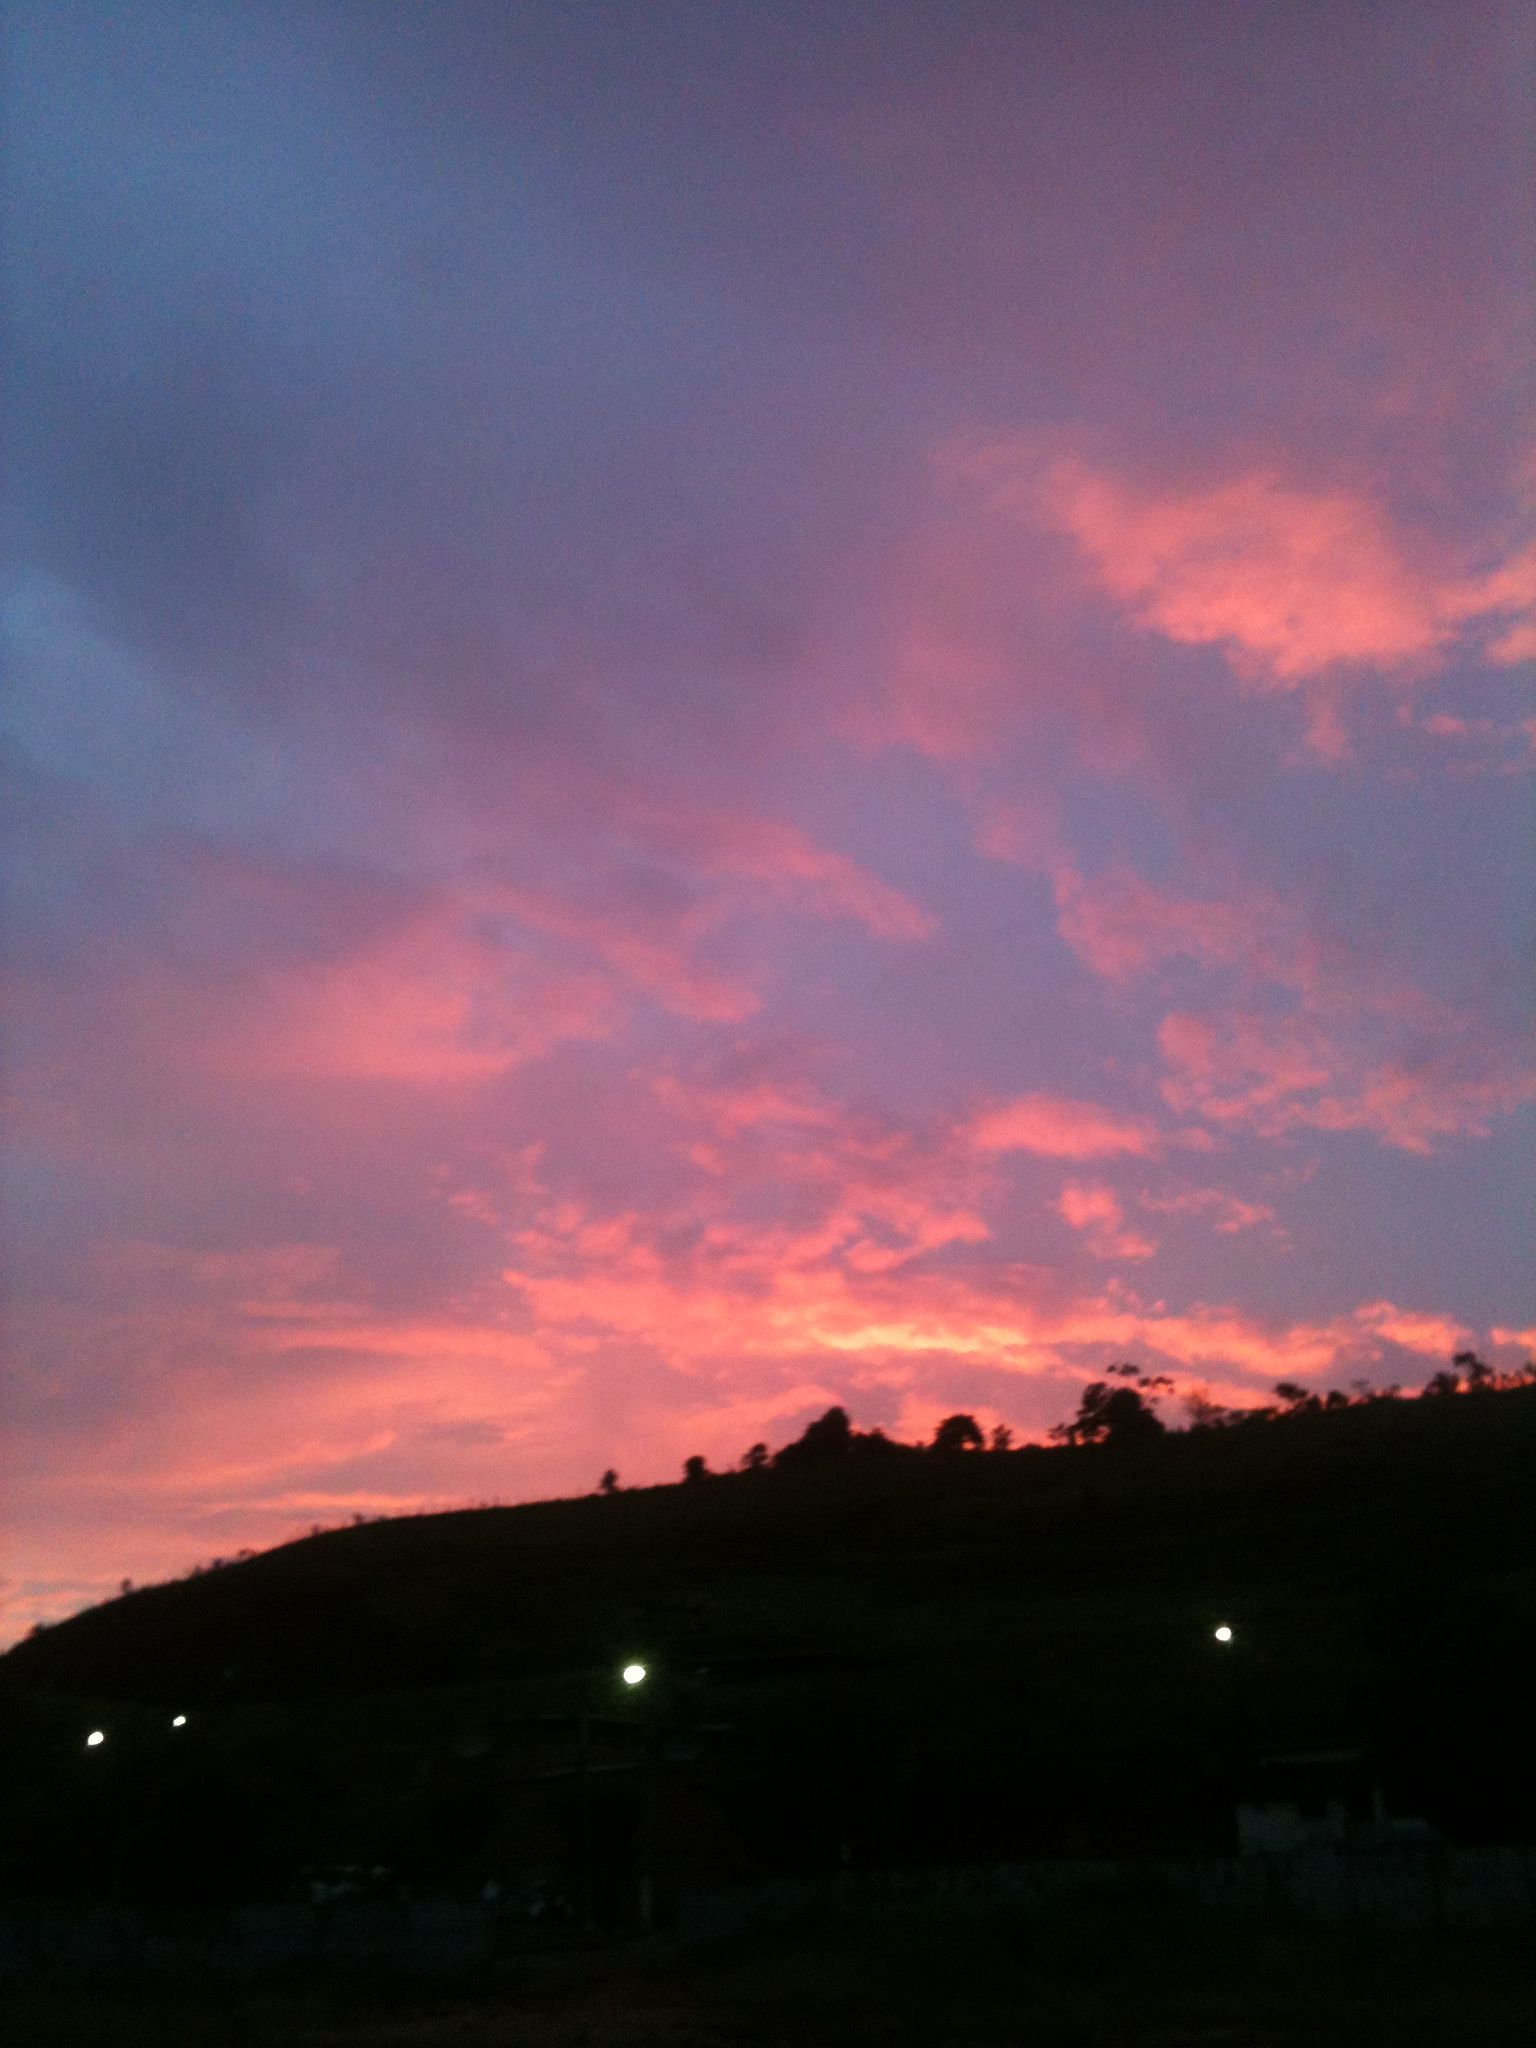 Morning sunshine in Lima Duarte, MG - Brasil